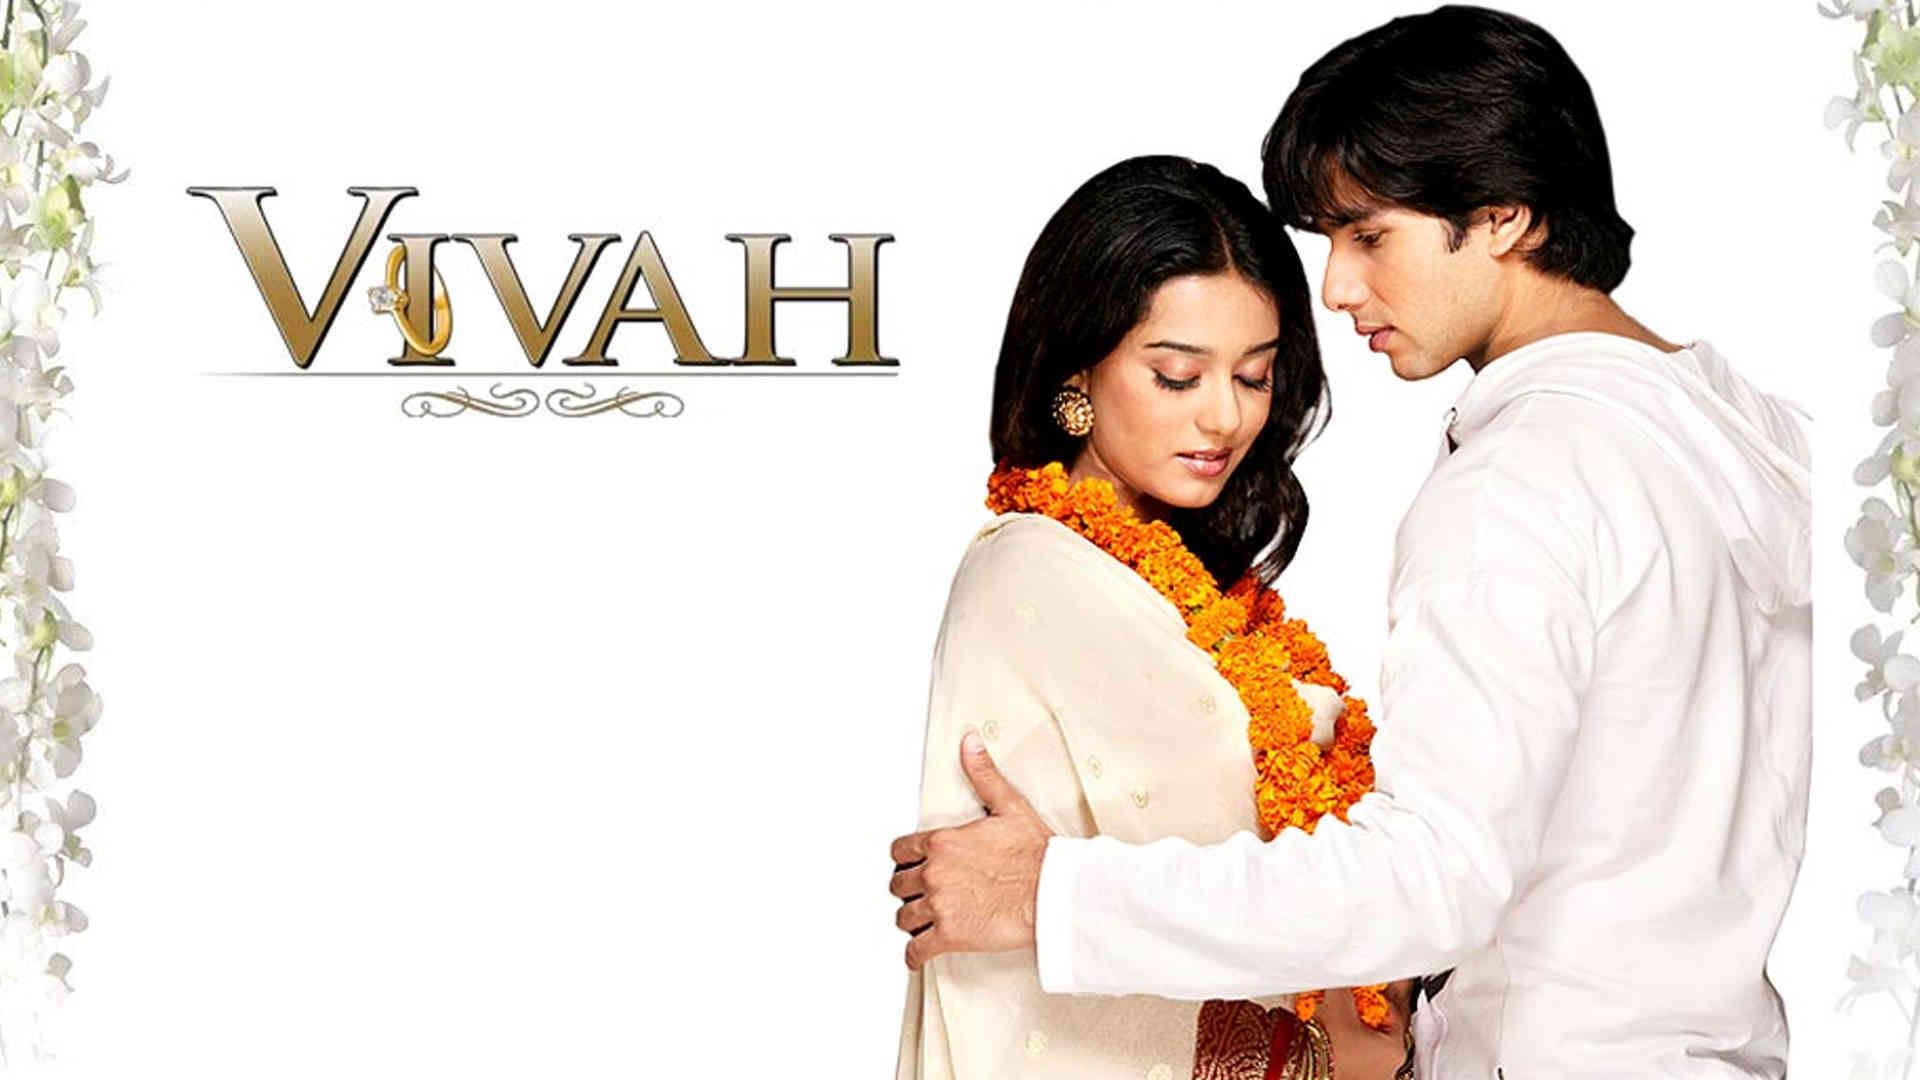 Watch Vivah Movie Online - Stream Full HD Movies on Airtel Xstream